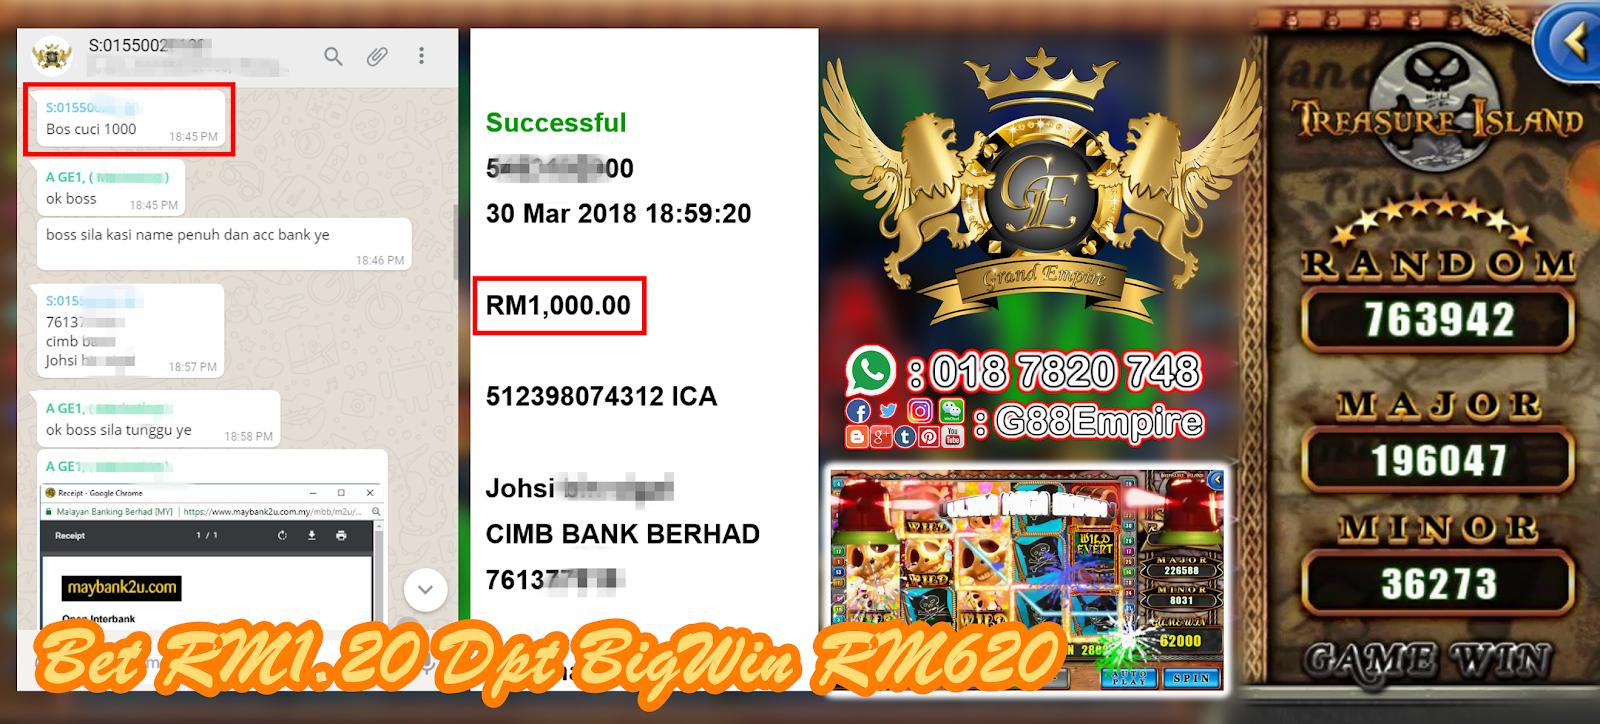 online mobile casino no deposit bonus south africa